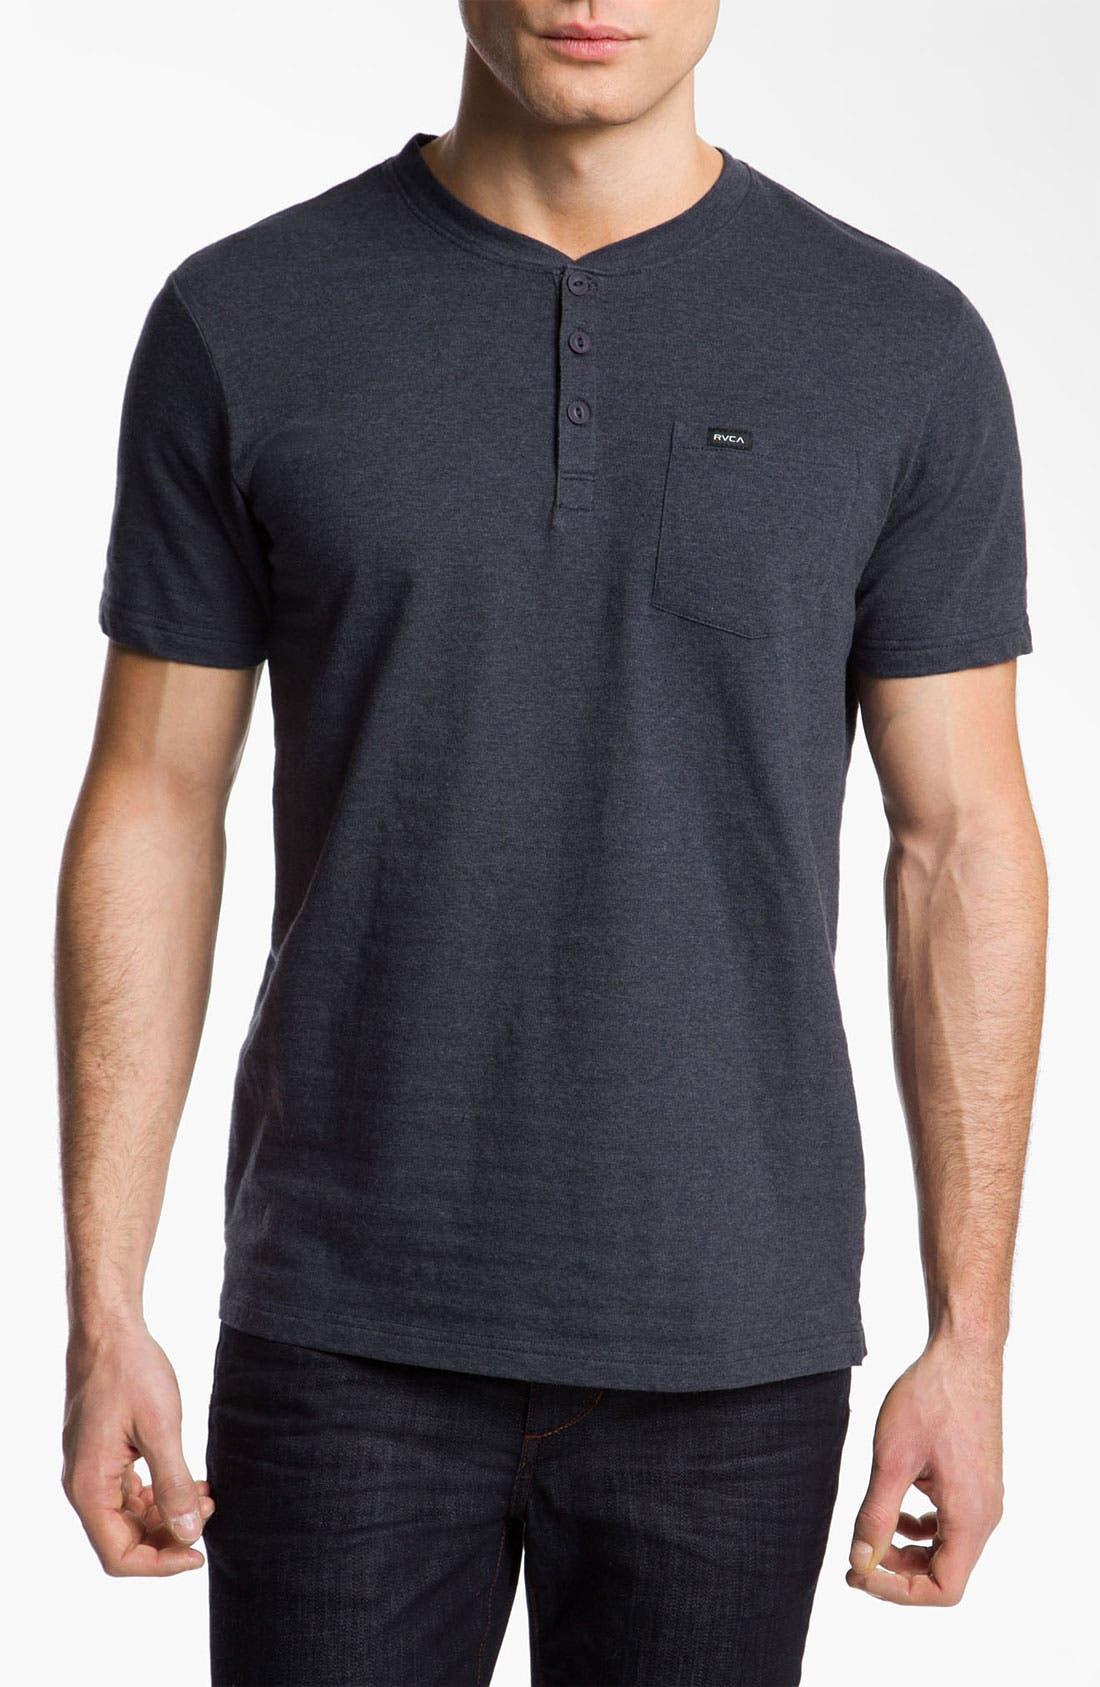 Main Image - RVCA 'Shopkeeper' Short Sleeve Henley T-Shirt